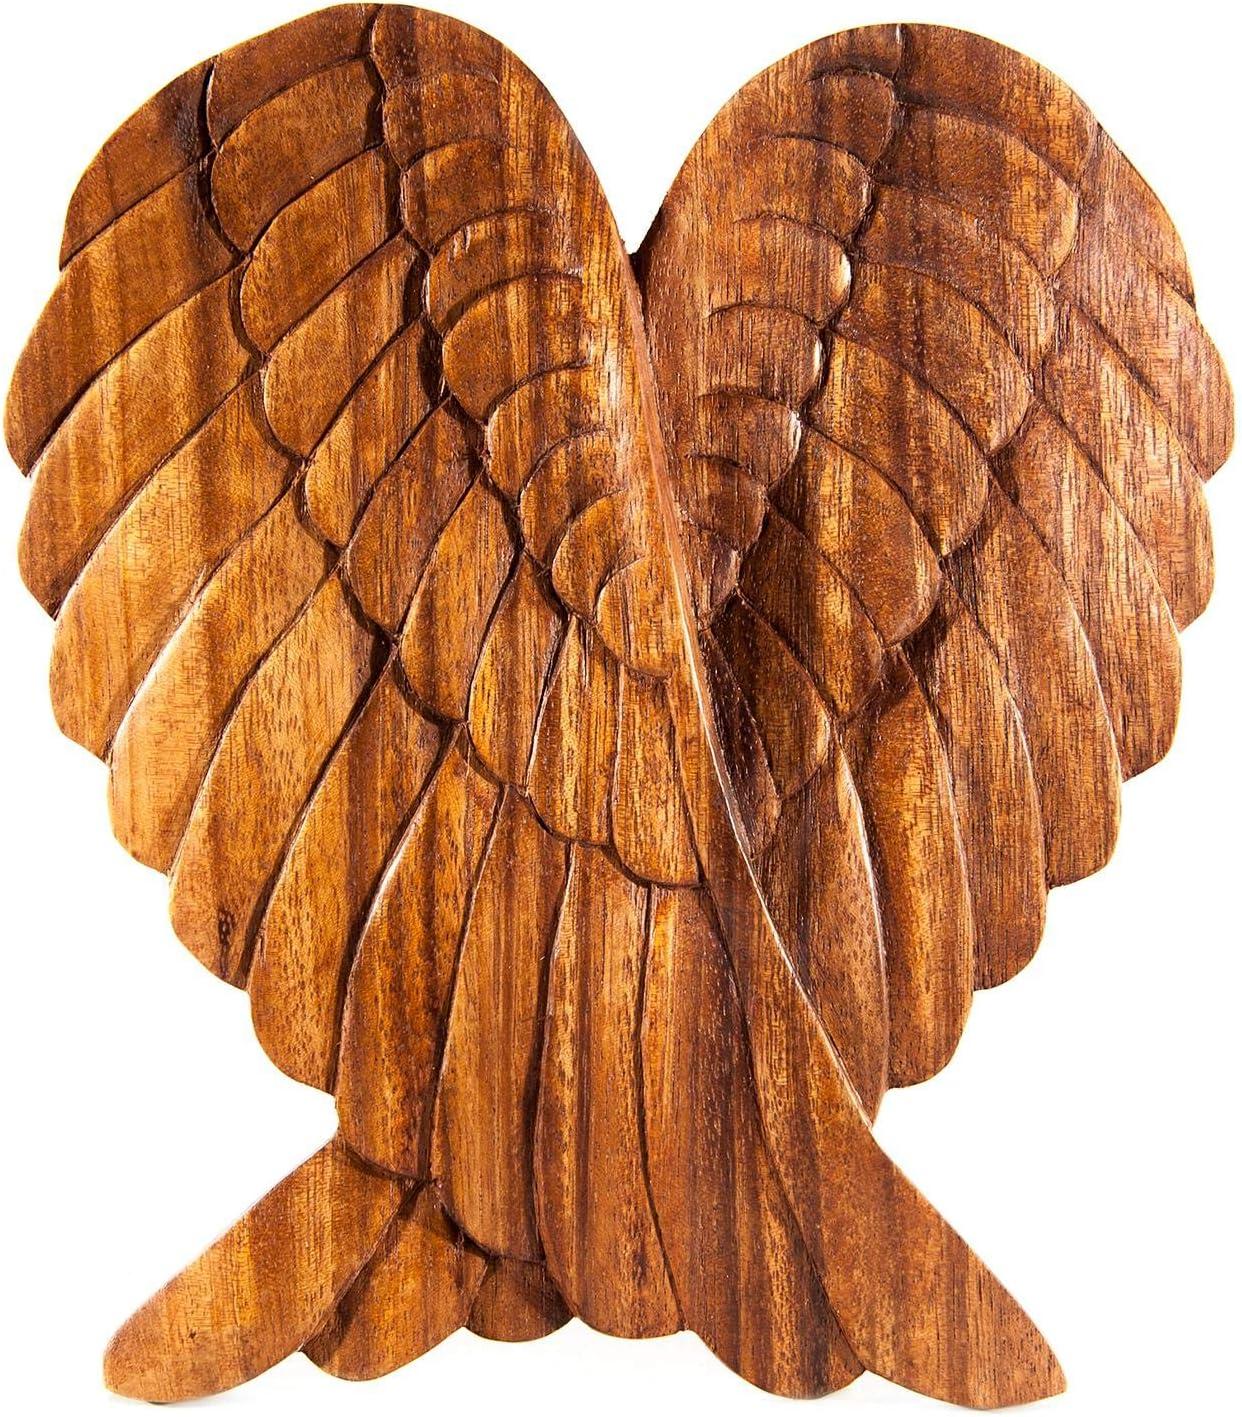 Windalf Engel Dekor Holzbild Wandrelief Amanda 22 cm Engels Fl/ügel Holzornament Bohemian Wandojekt Handarbeit aus Holz